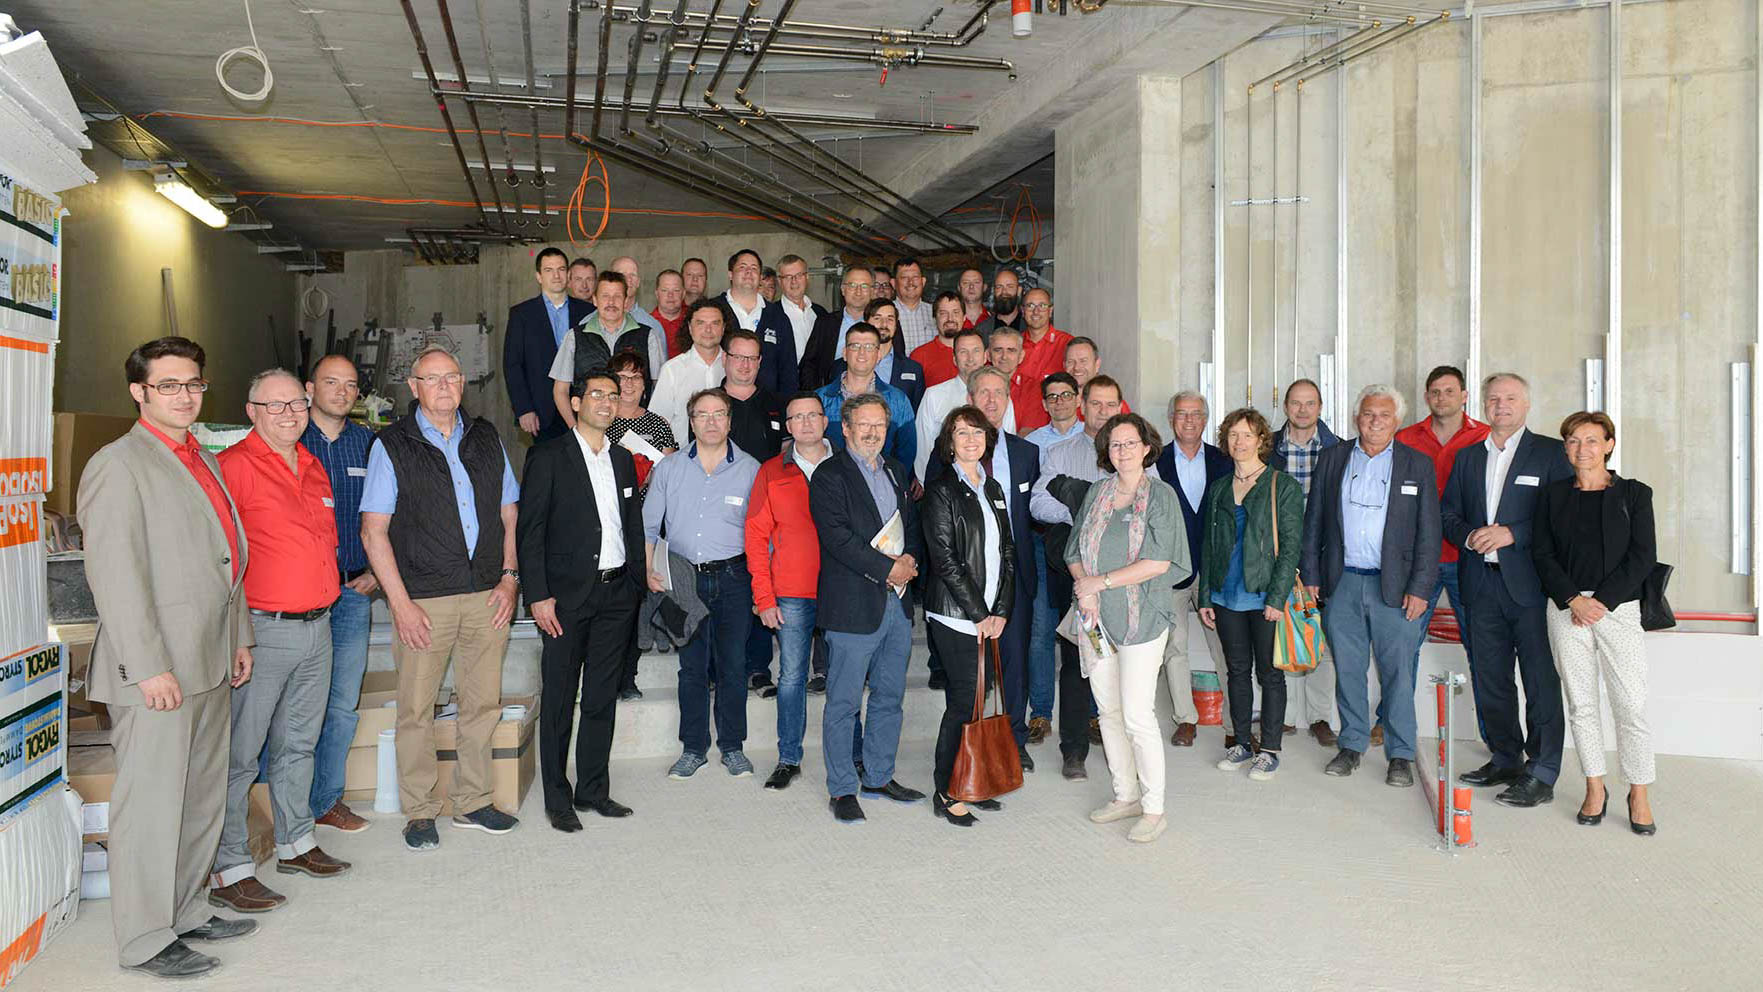 DTB-Ausbau Architektentag 2018